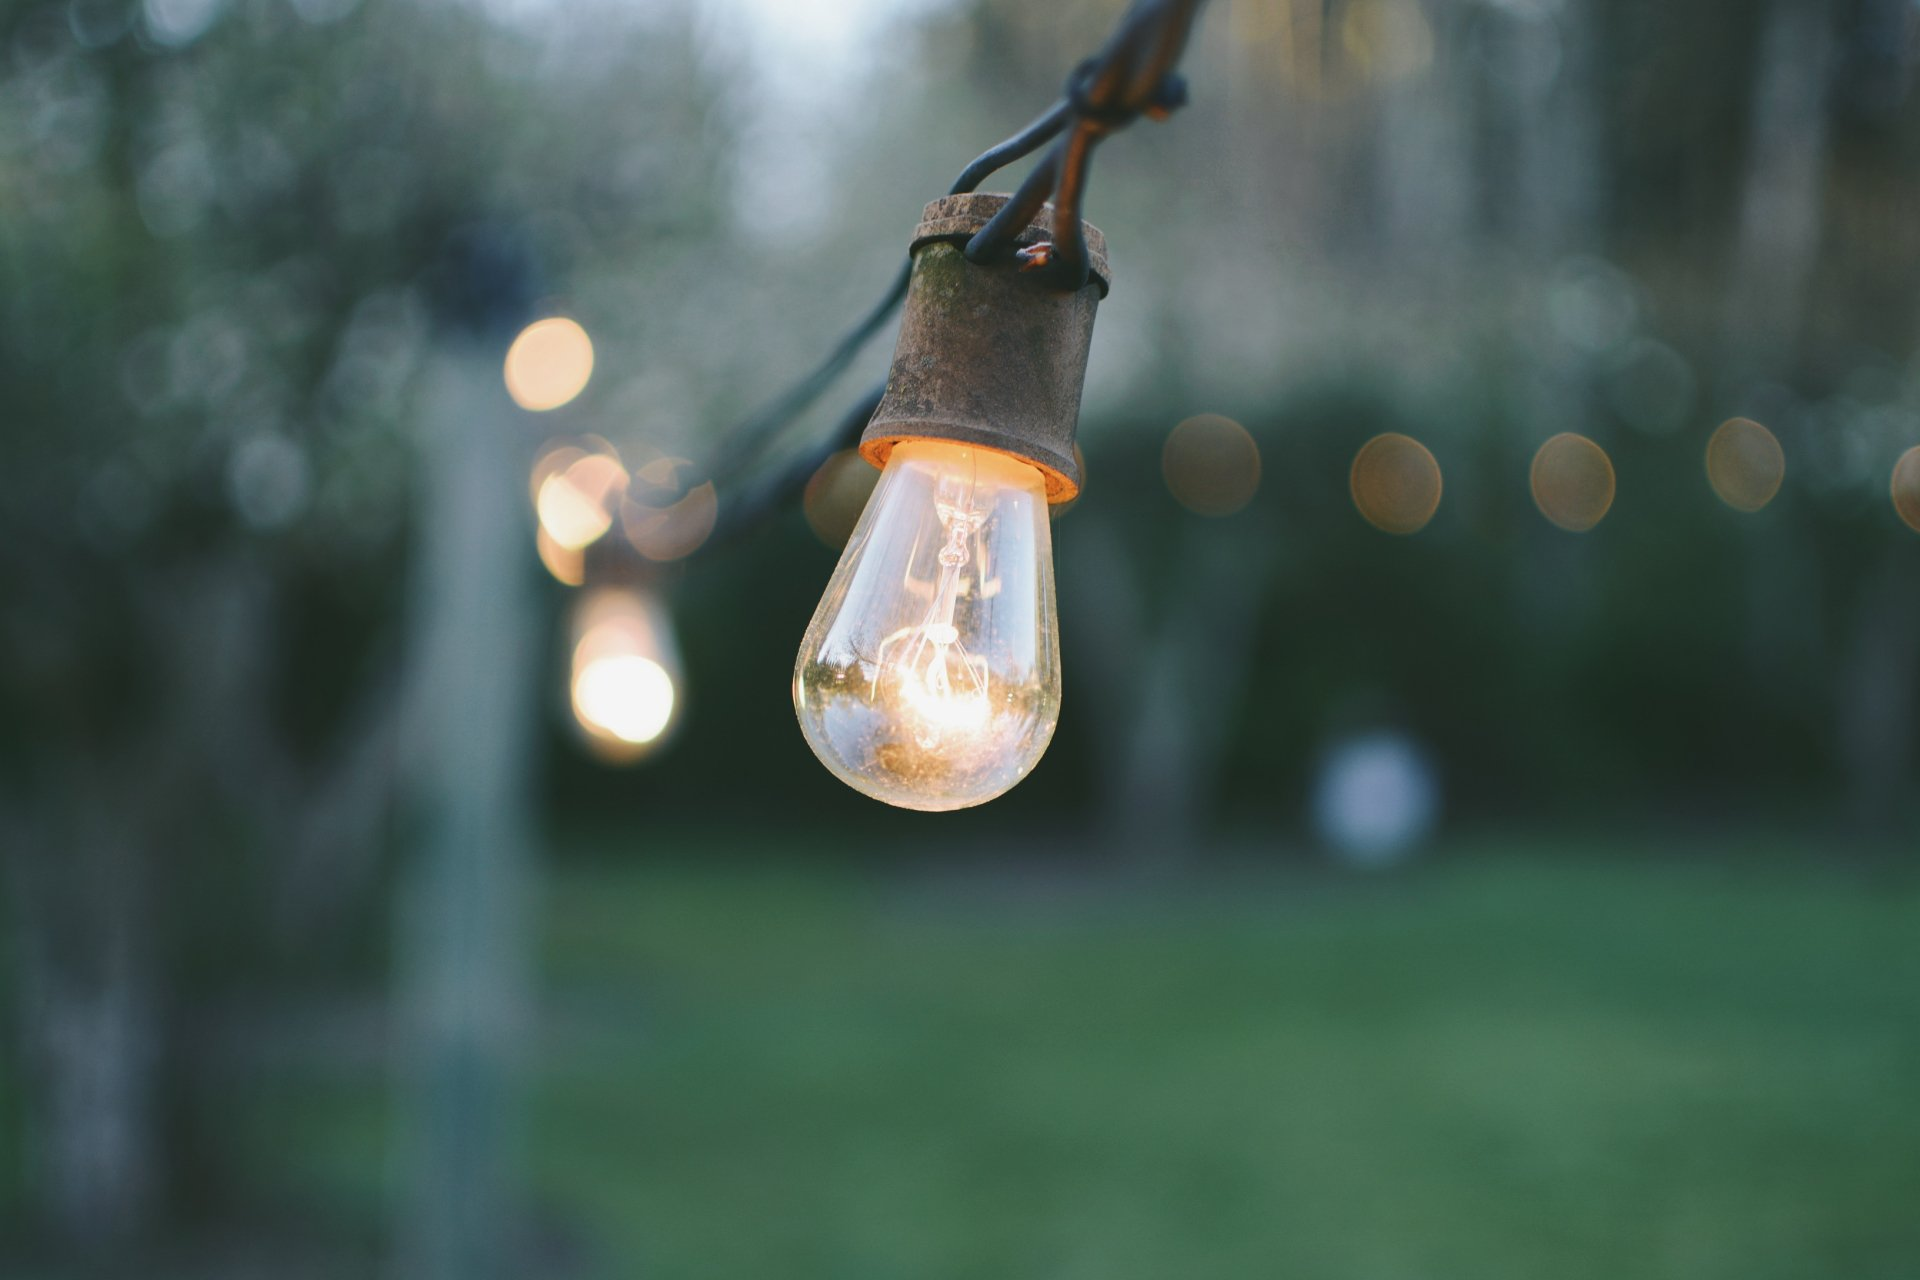 Man Made - Light Bulb  Depth Of Field Wallpaper